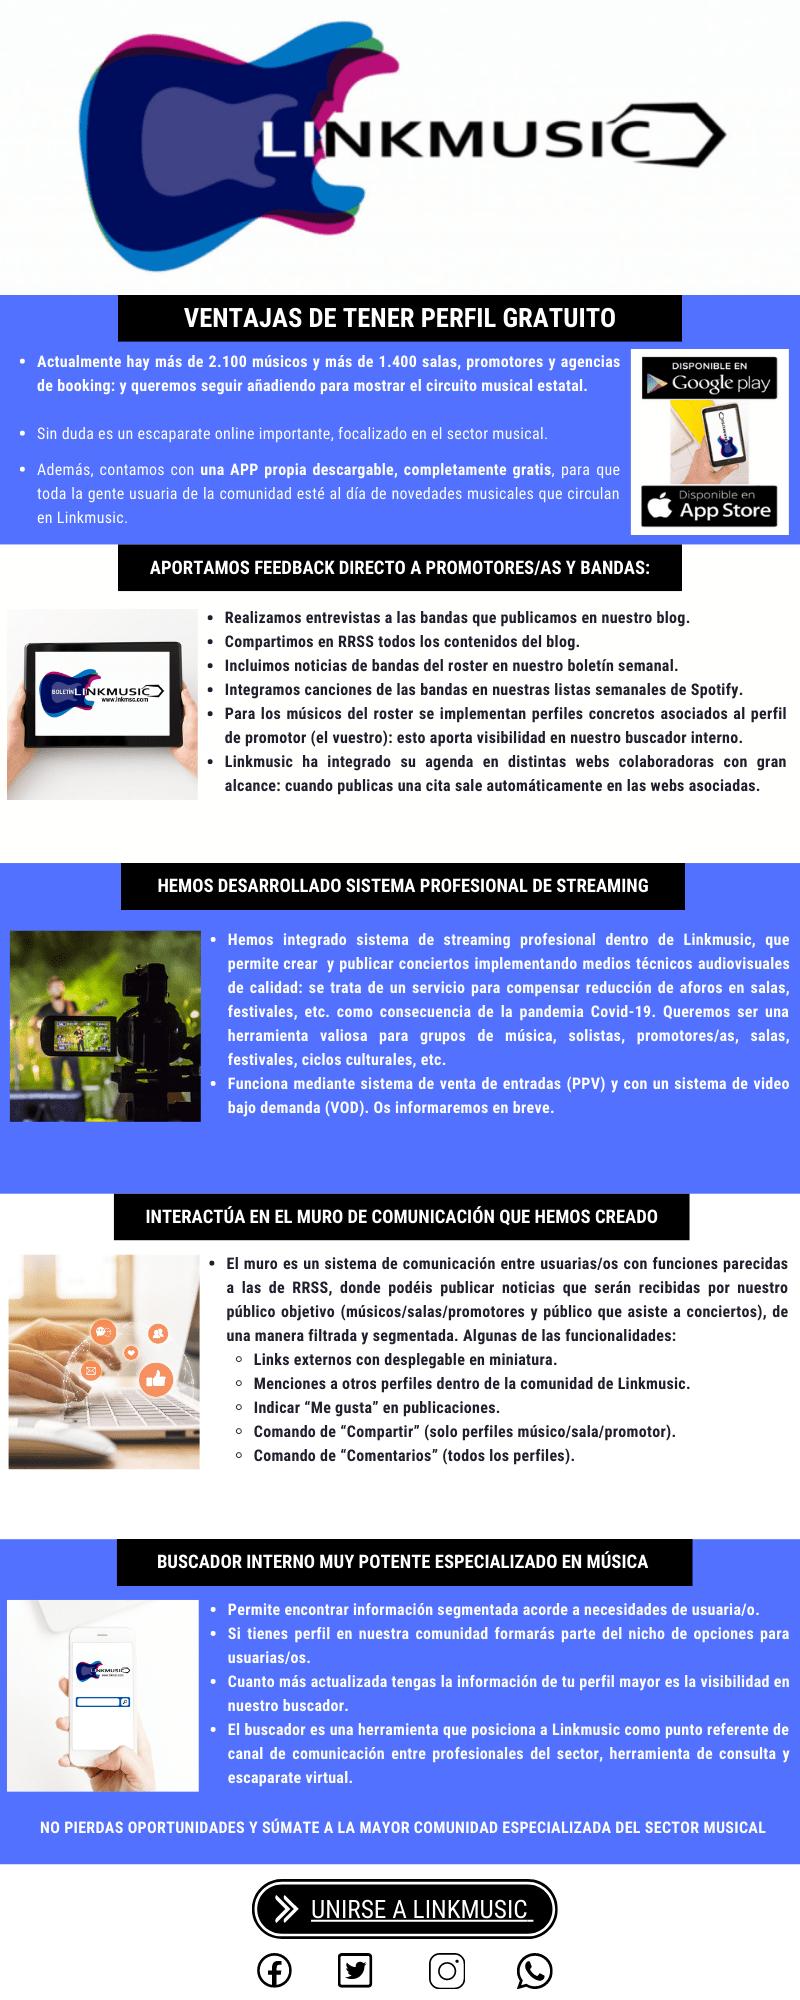 Cómo funciona Linkmusic - infografía - música - marketplace musical